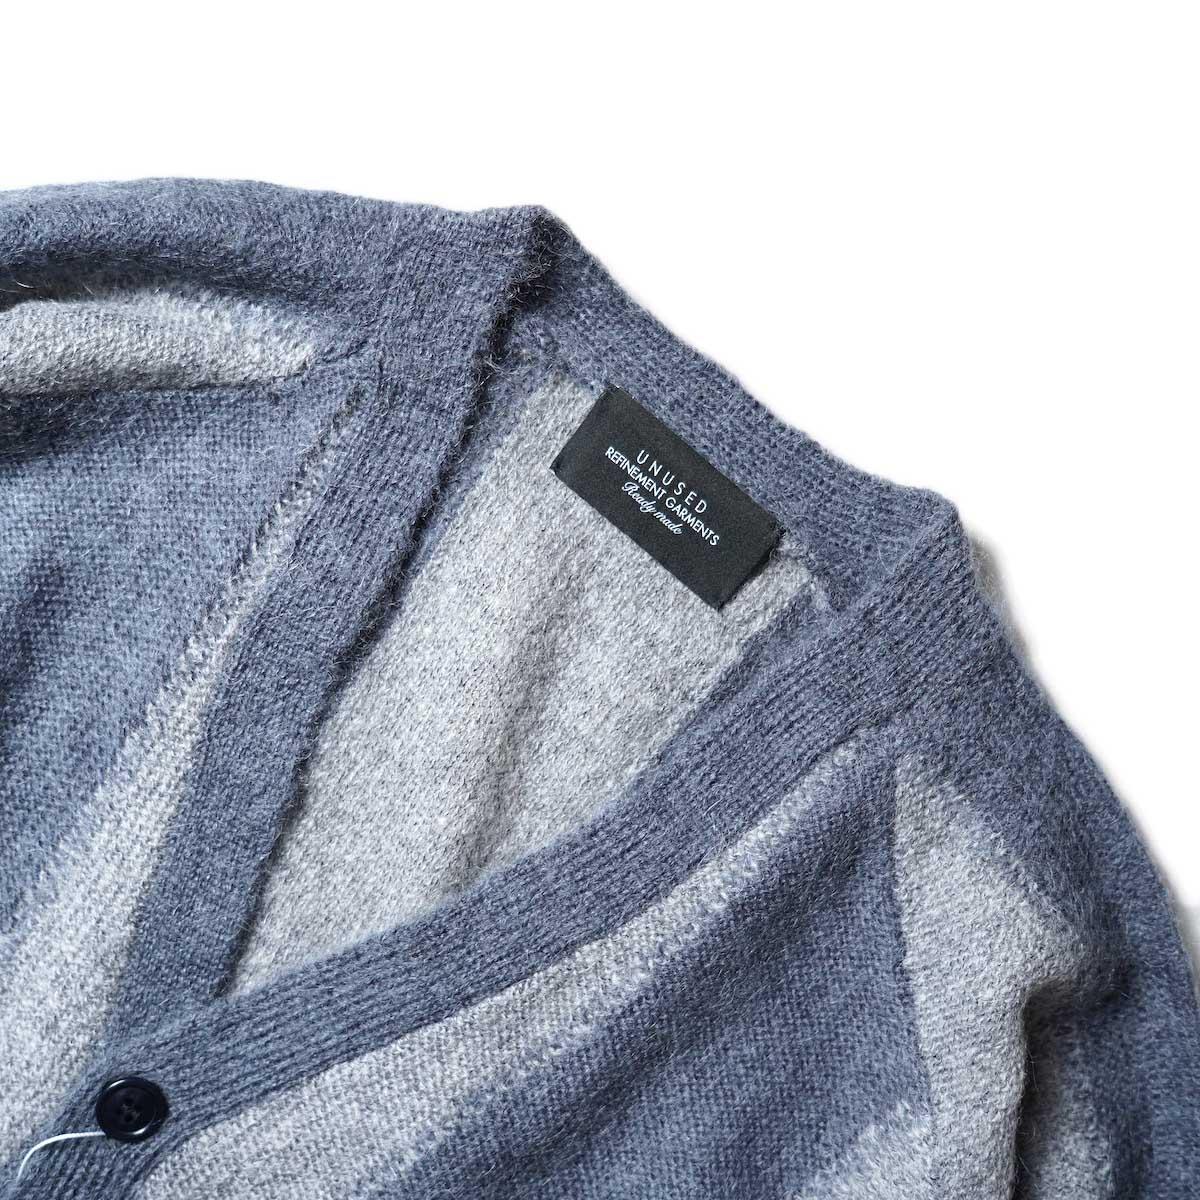 UNUSED / US2108 Stripe Cardigan (Light Gray × Charcoal)ネック